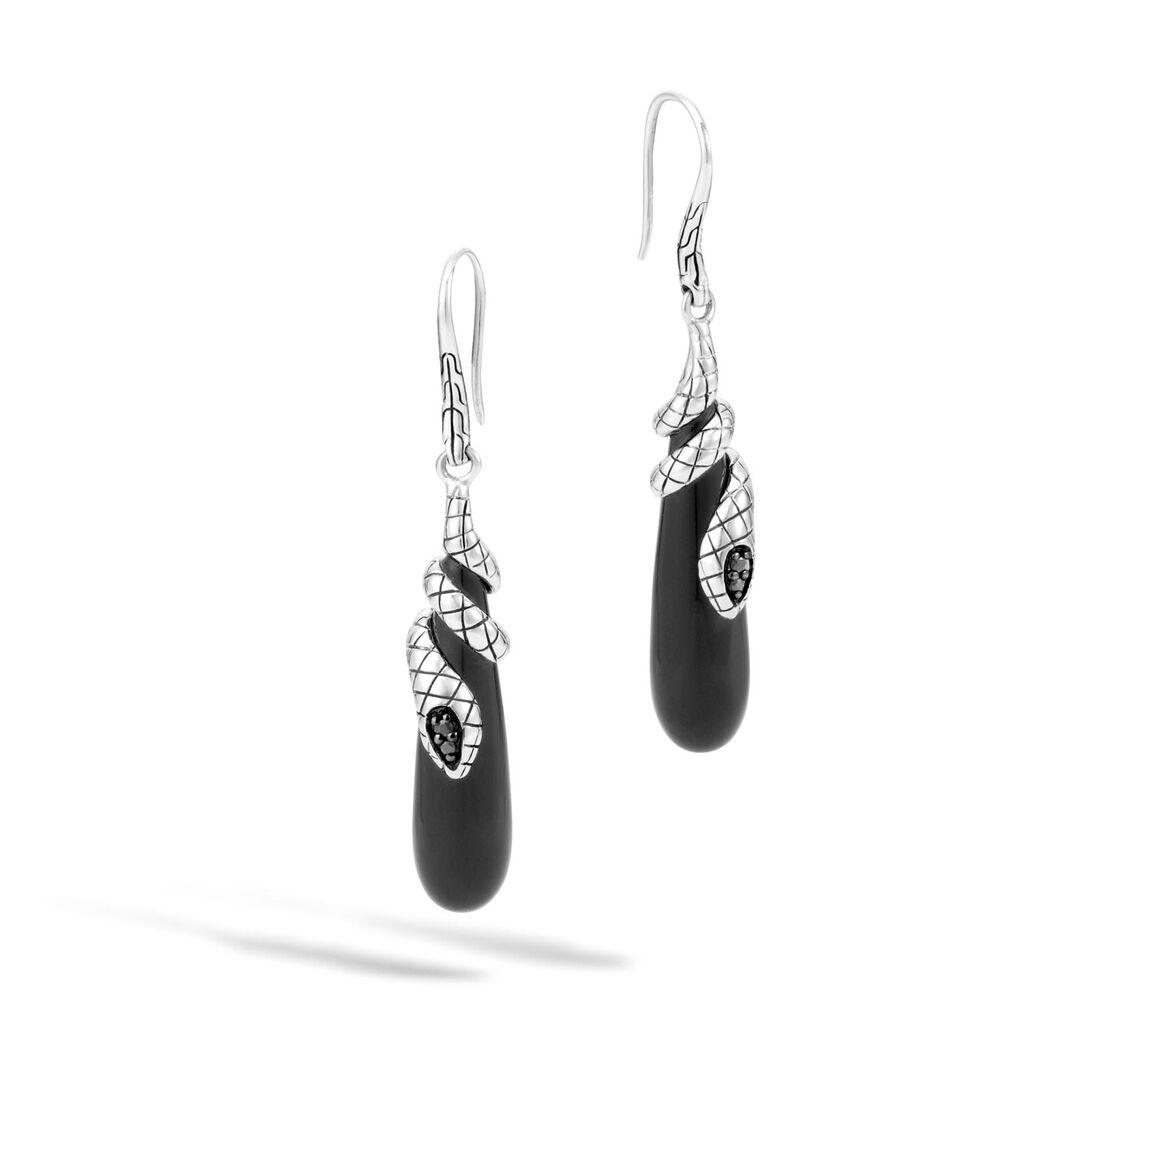 Legends Cobra Drop Earring in Silver with Gemstone